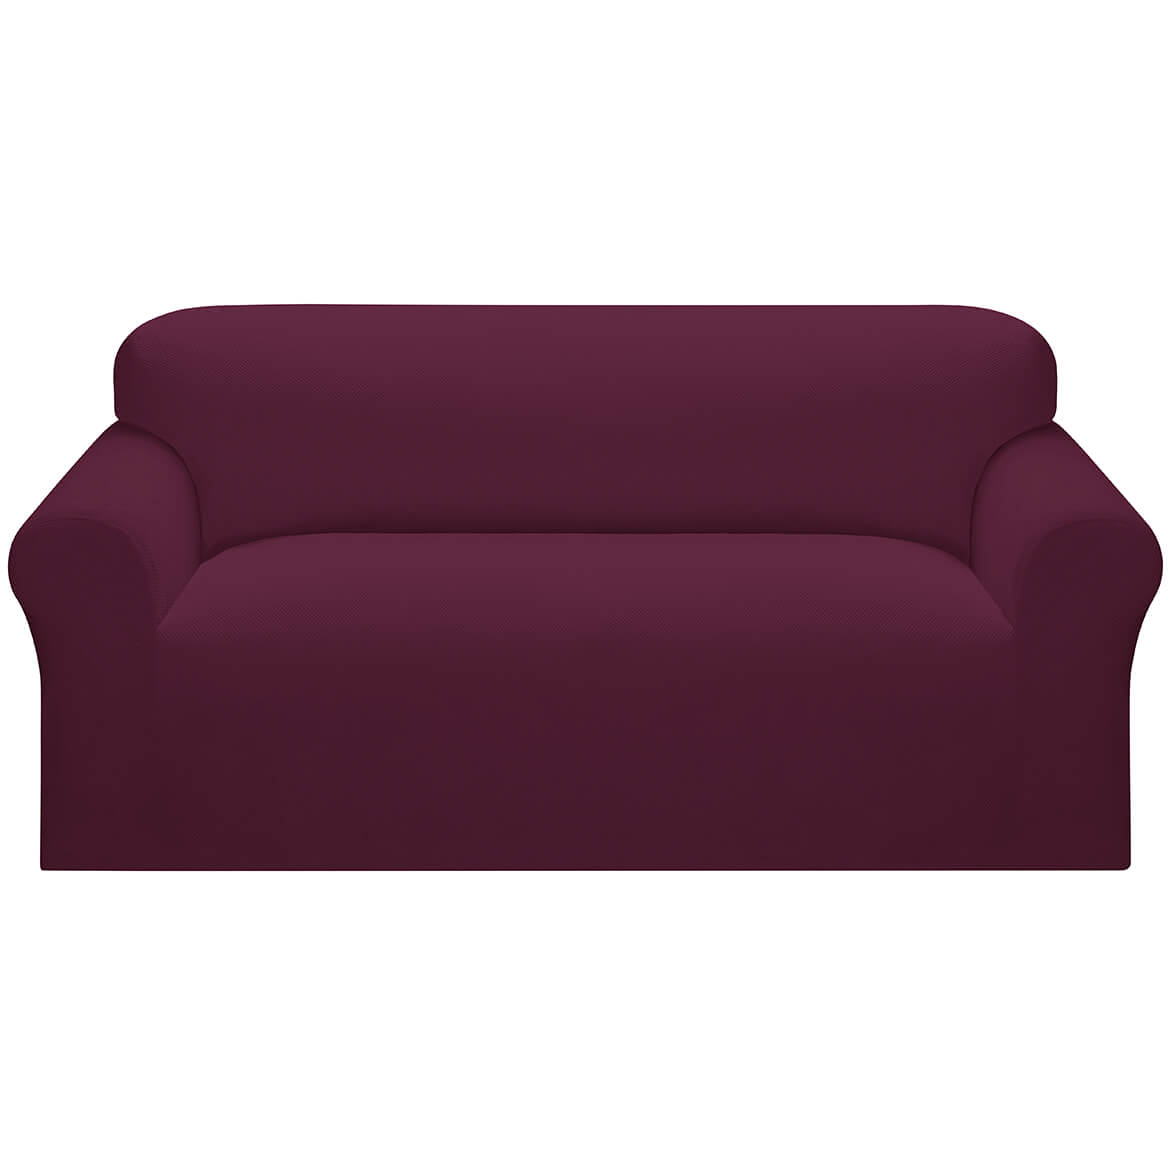 Kathy Ireland Daybreak Sofa Slipcover